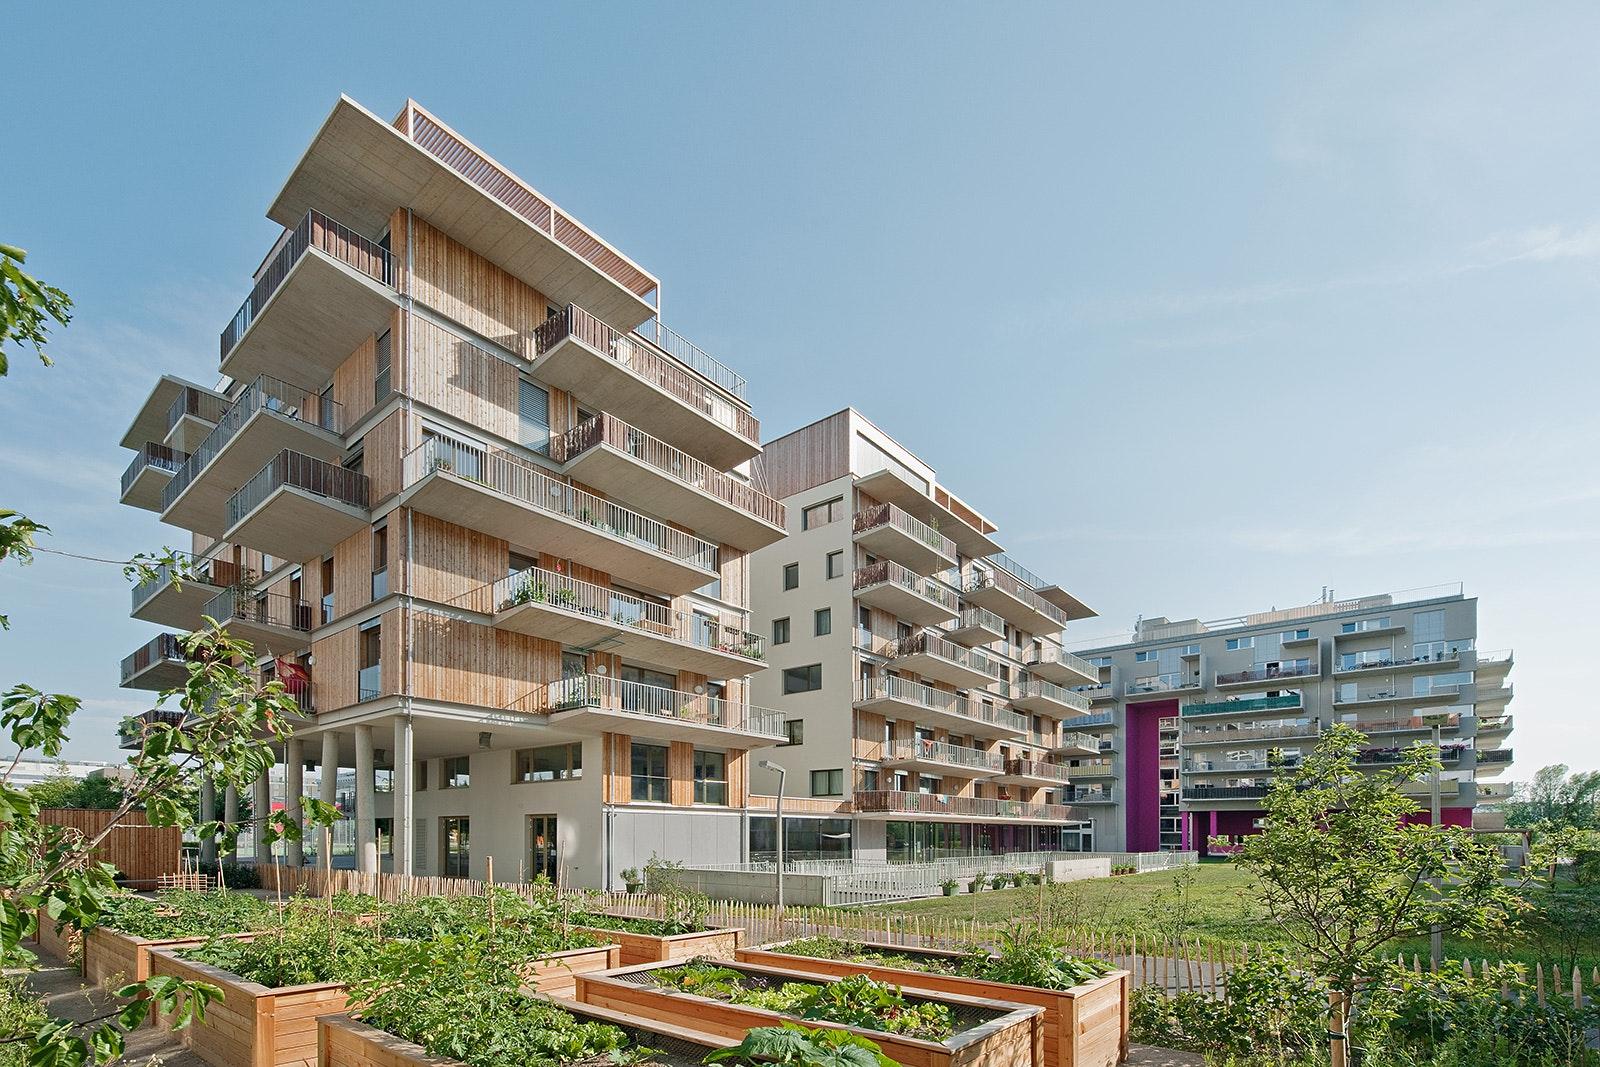 U201cSocial Housing U2013 New European Projectsu201d Showcases Affordable Housing Design  Strategies Across The Continent